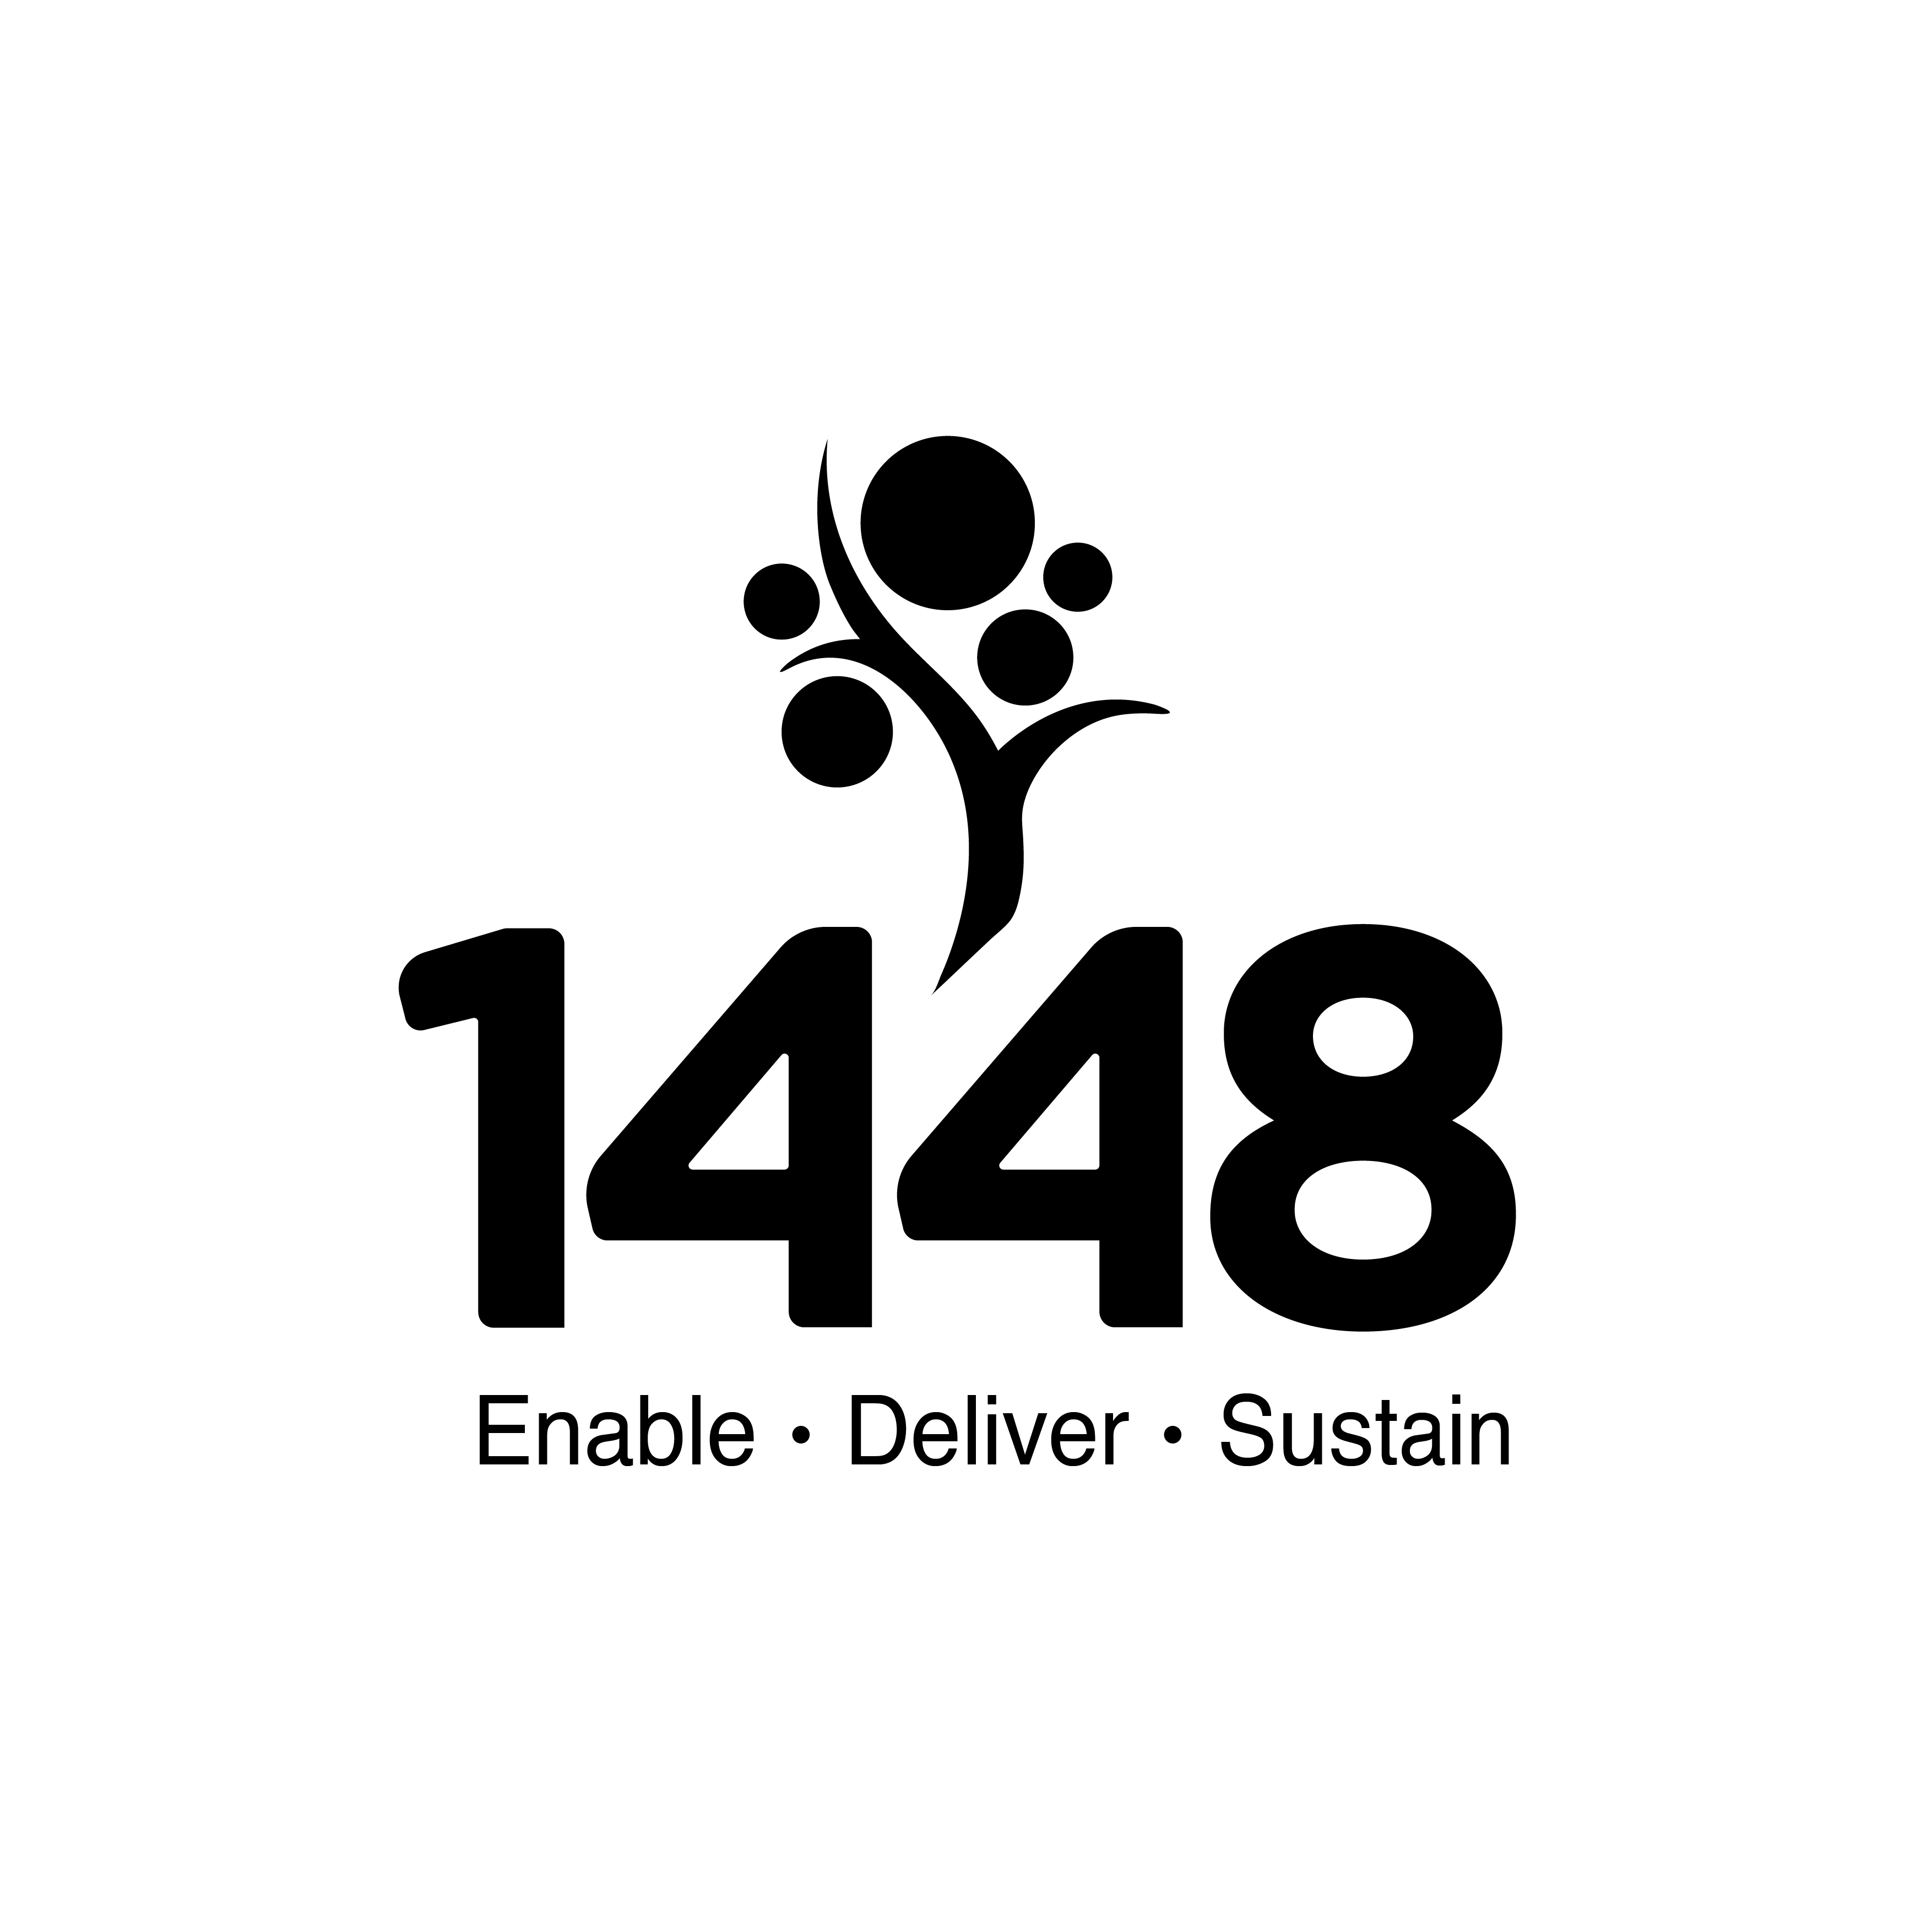 1448 logo from Canberra logo design company Fresh Creative